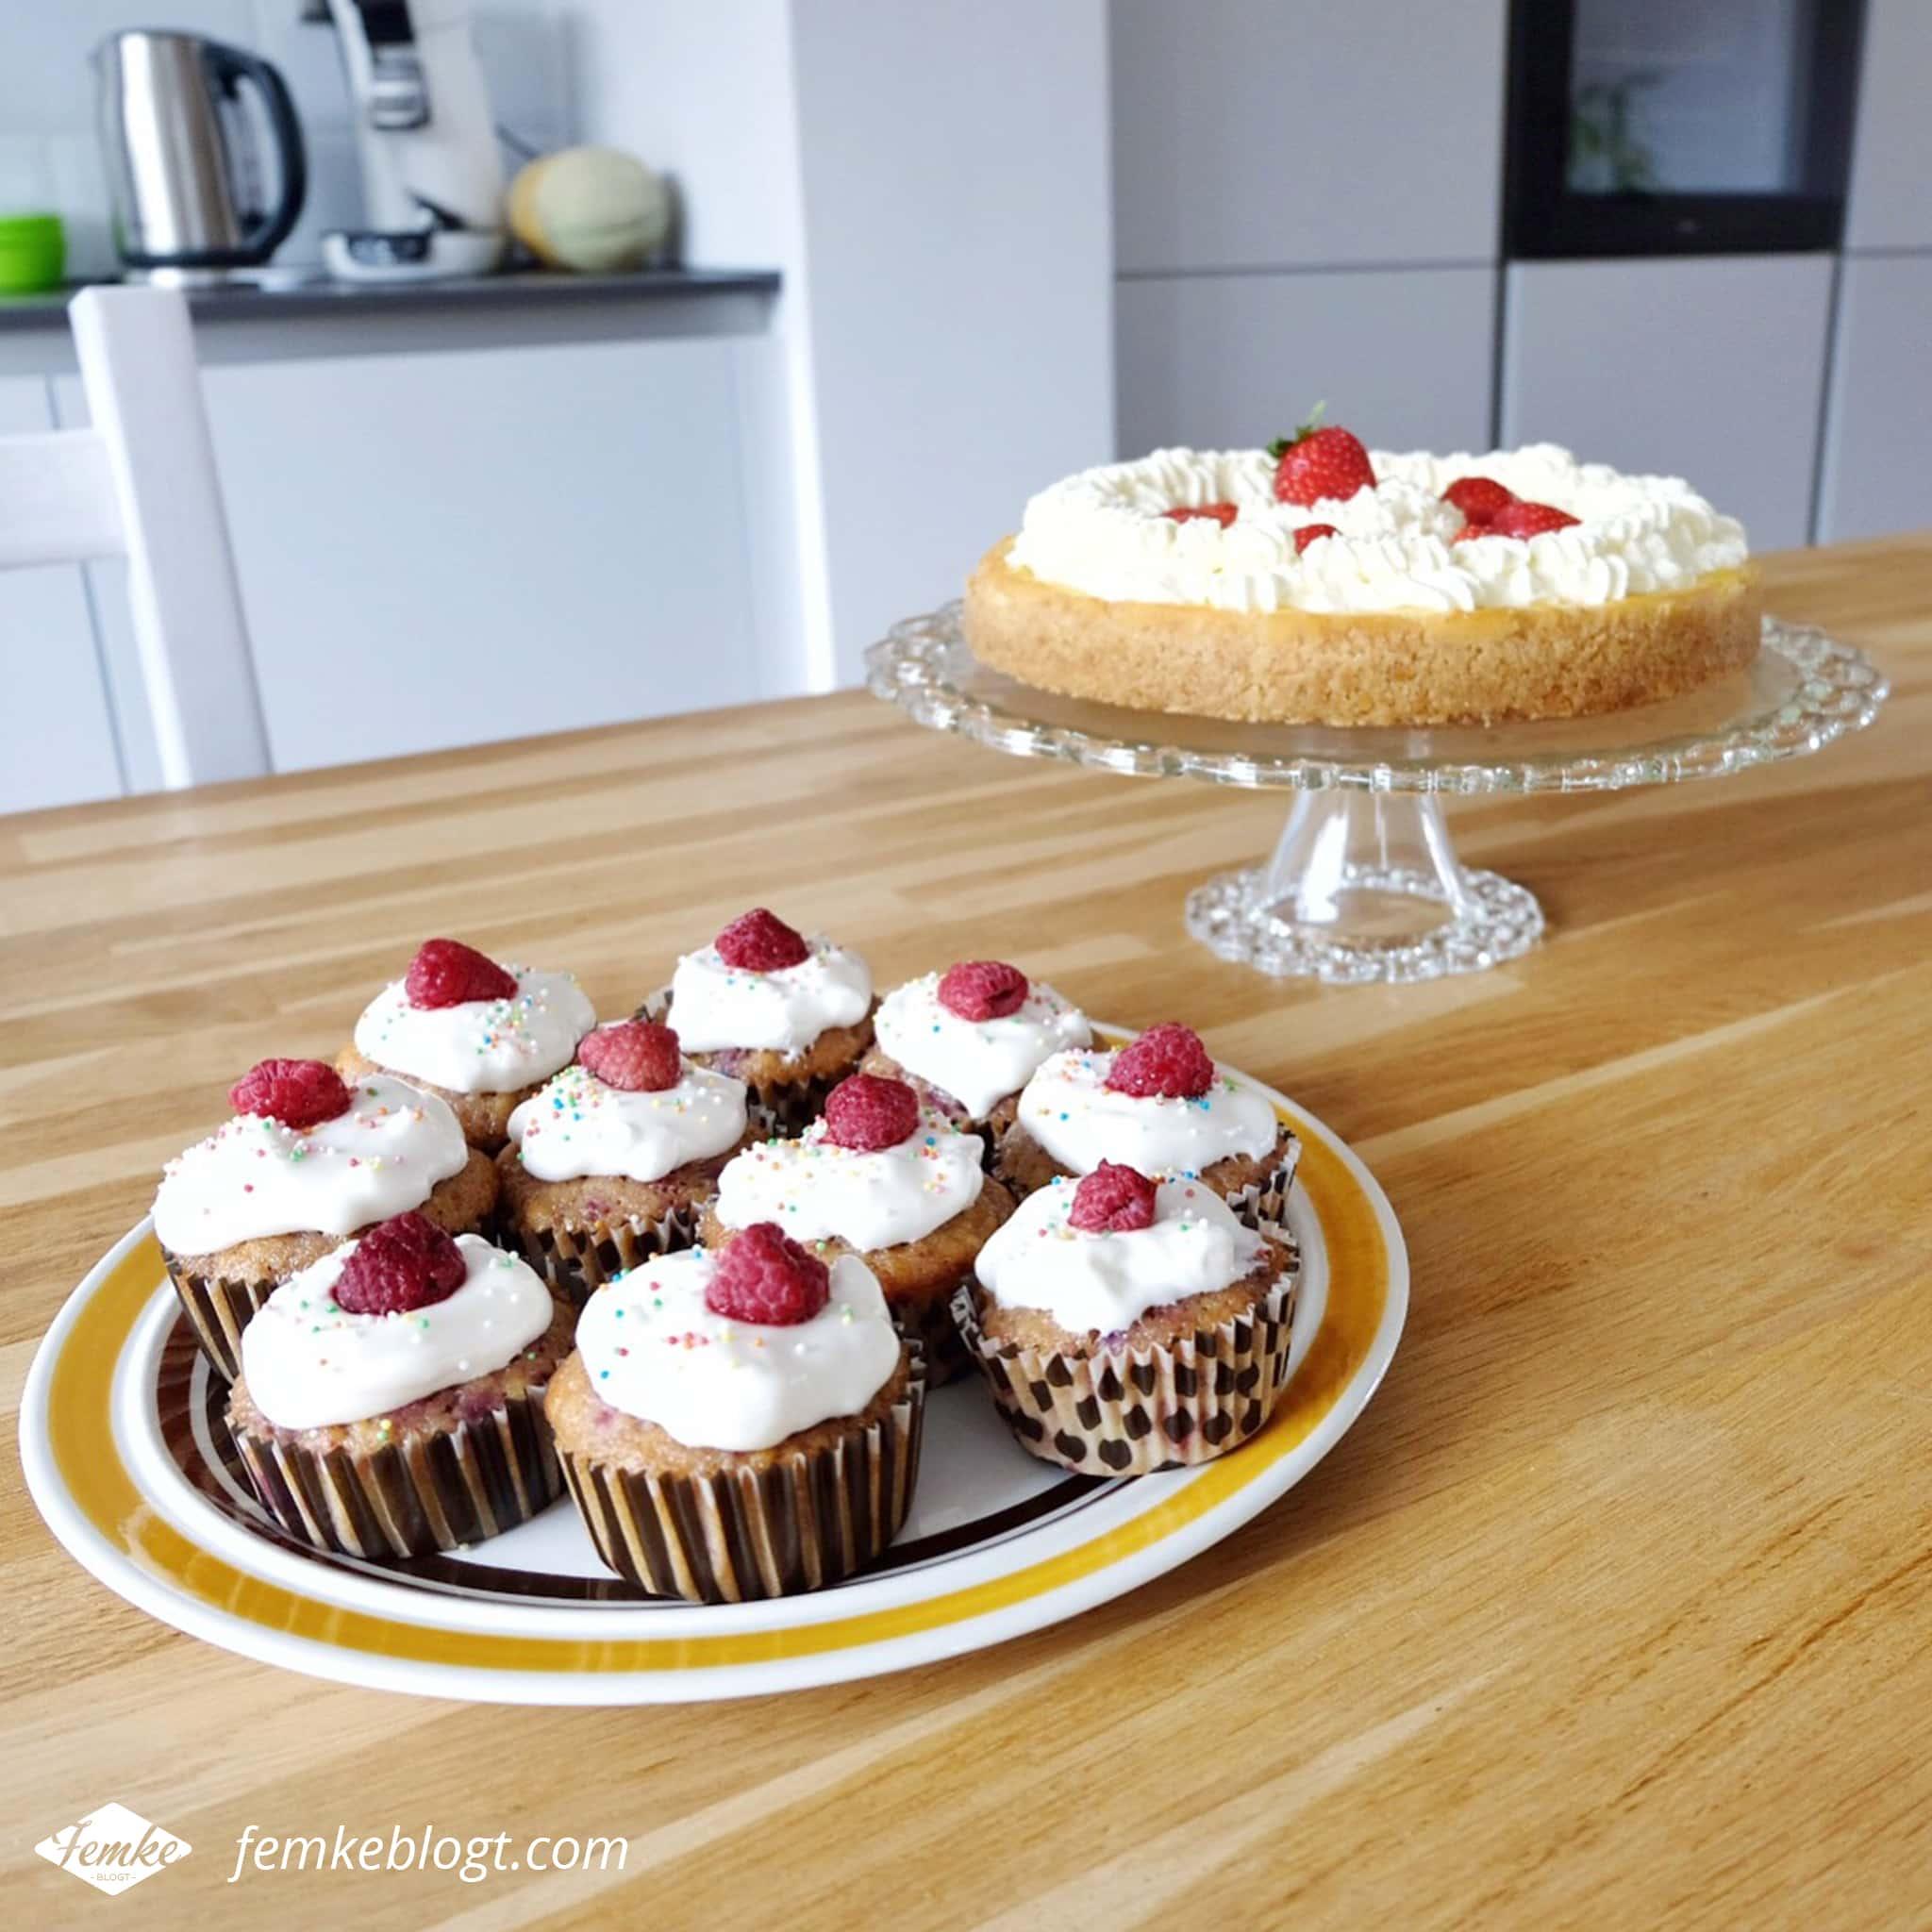 Maandoverzicht juli | Citroen cheesecake en frambozen cupcakes